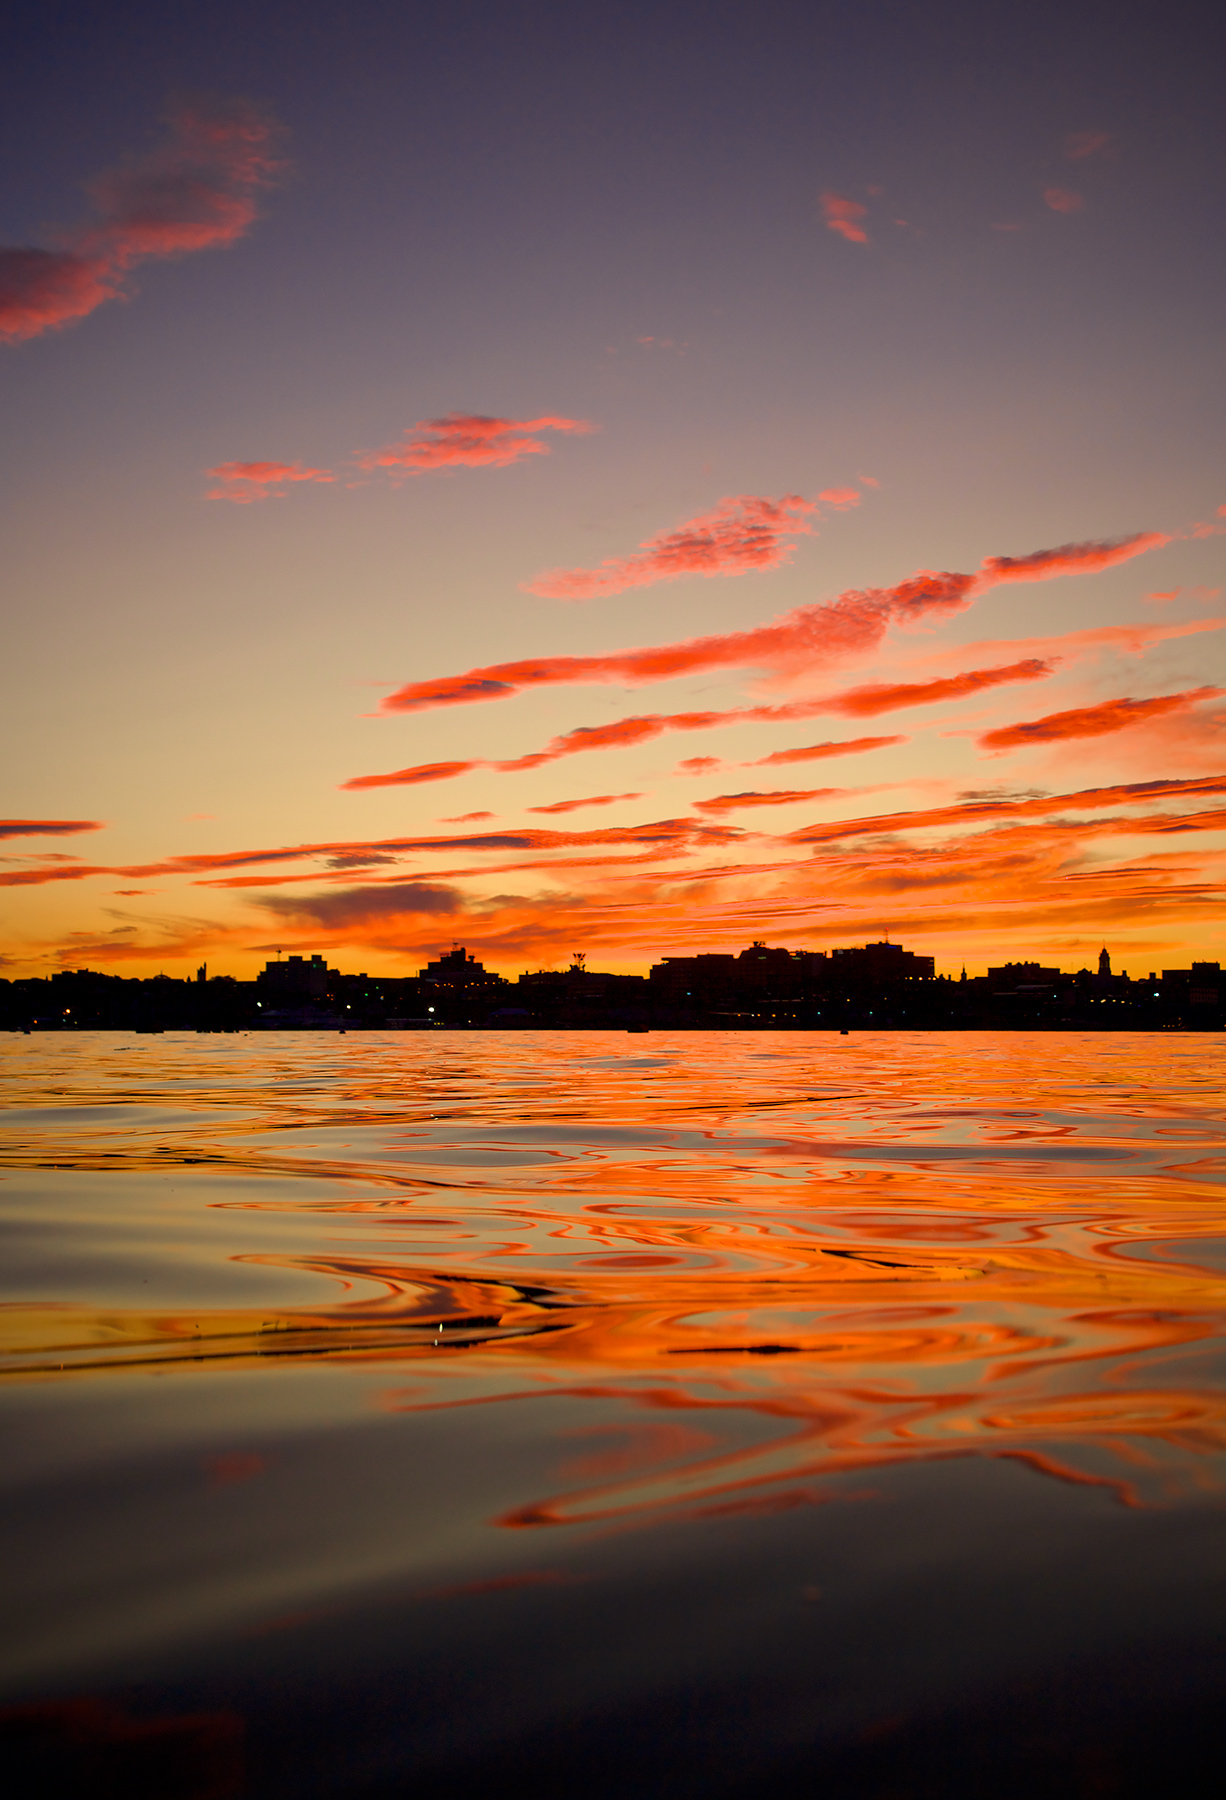 Dramatic sunset over Portland, Maine.